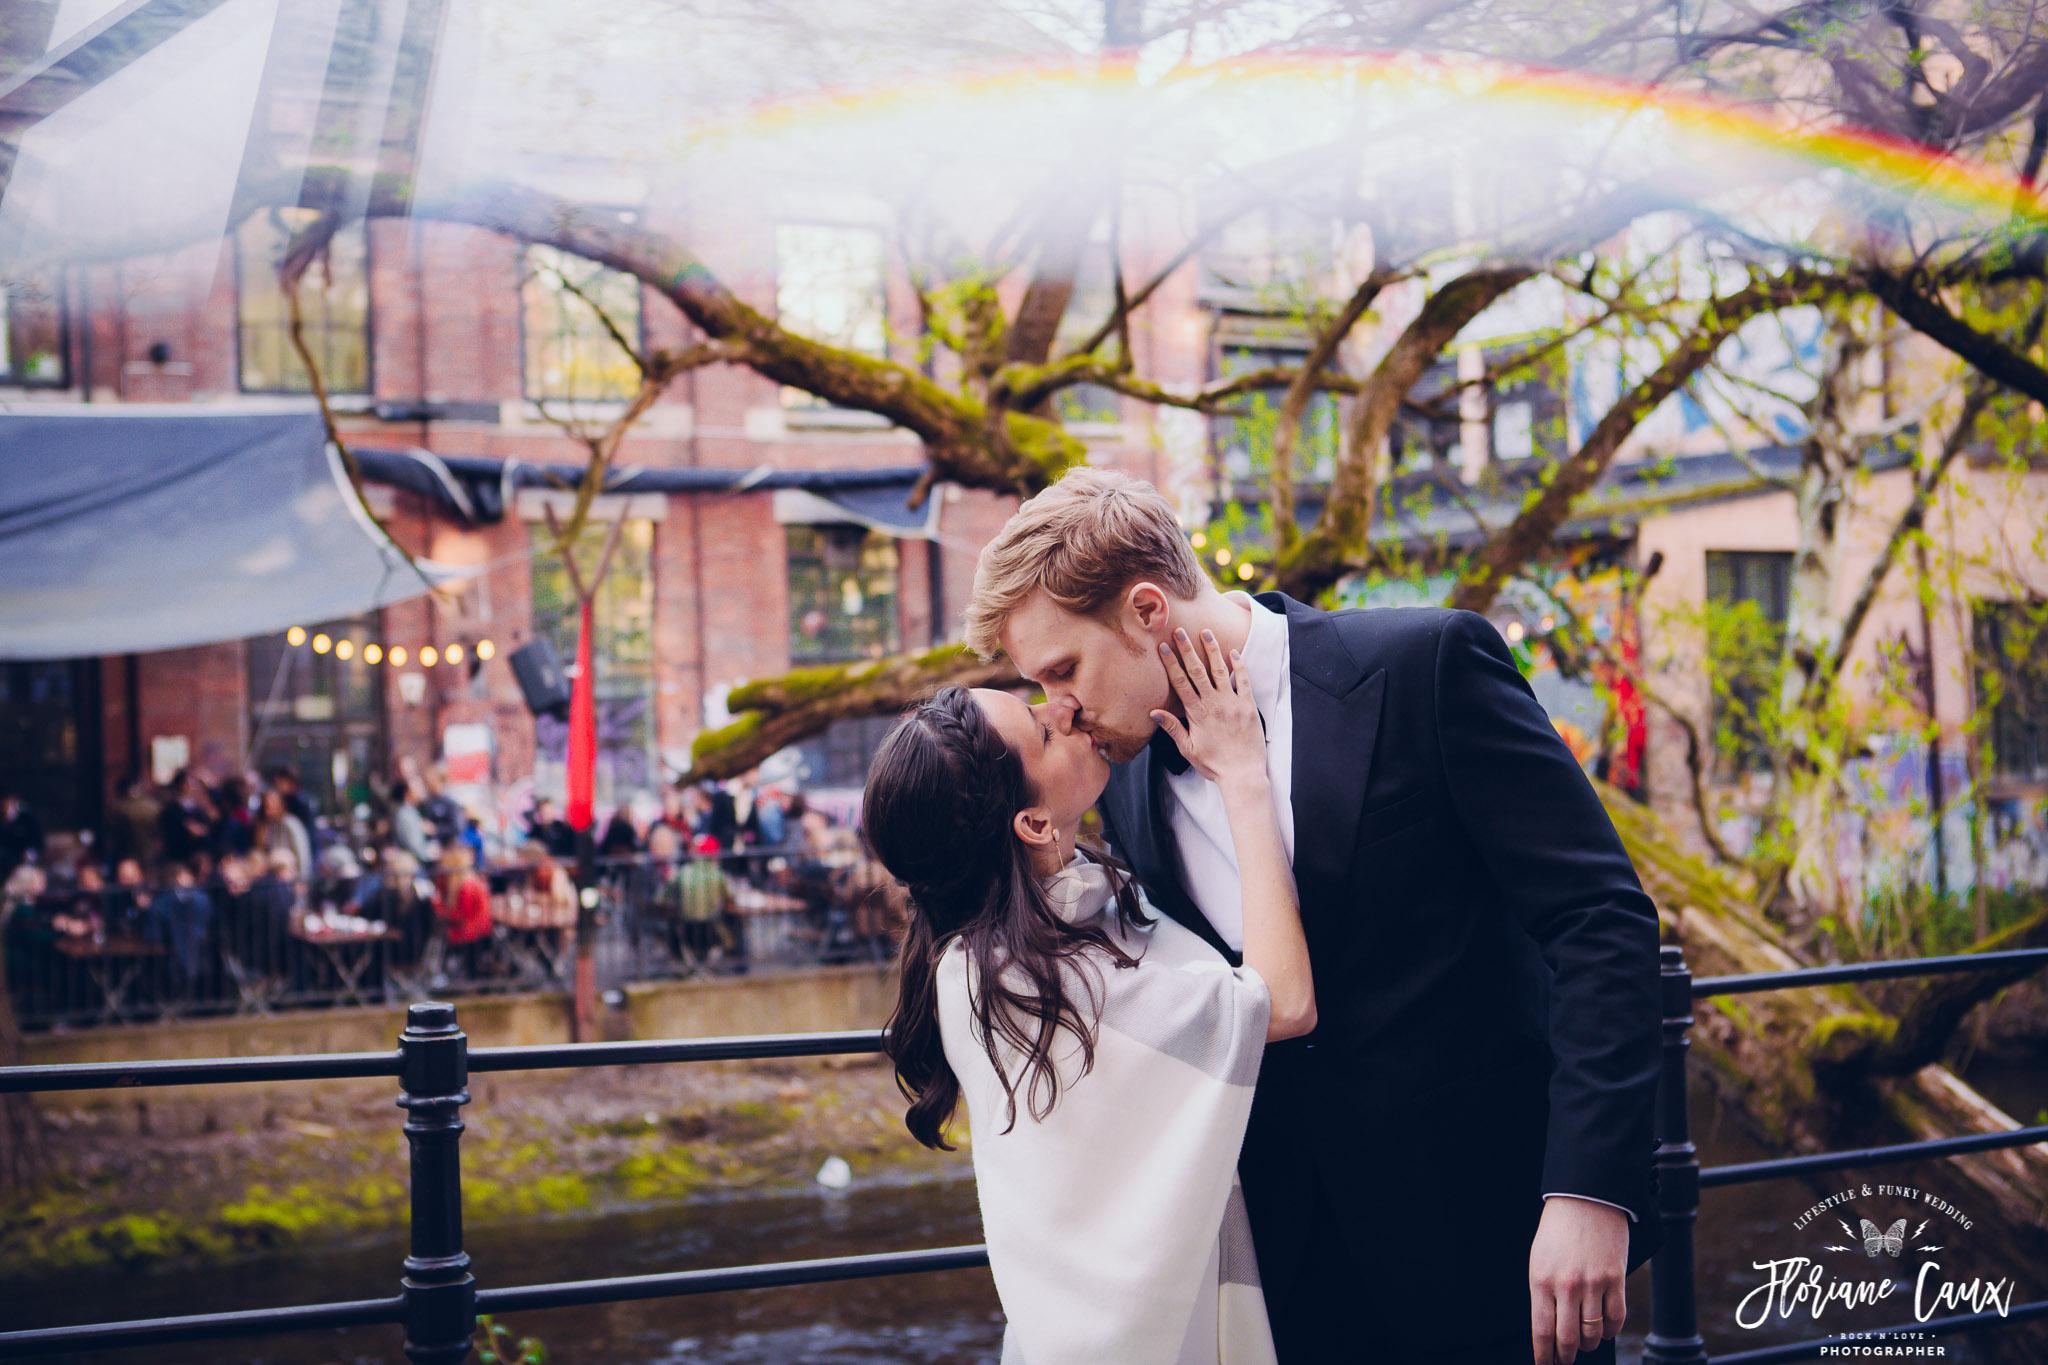 destination-wedding-photographer-oslo-norway-floriane-caux-40